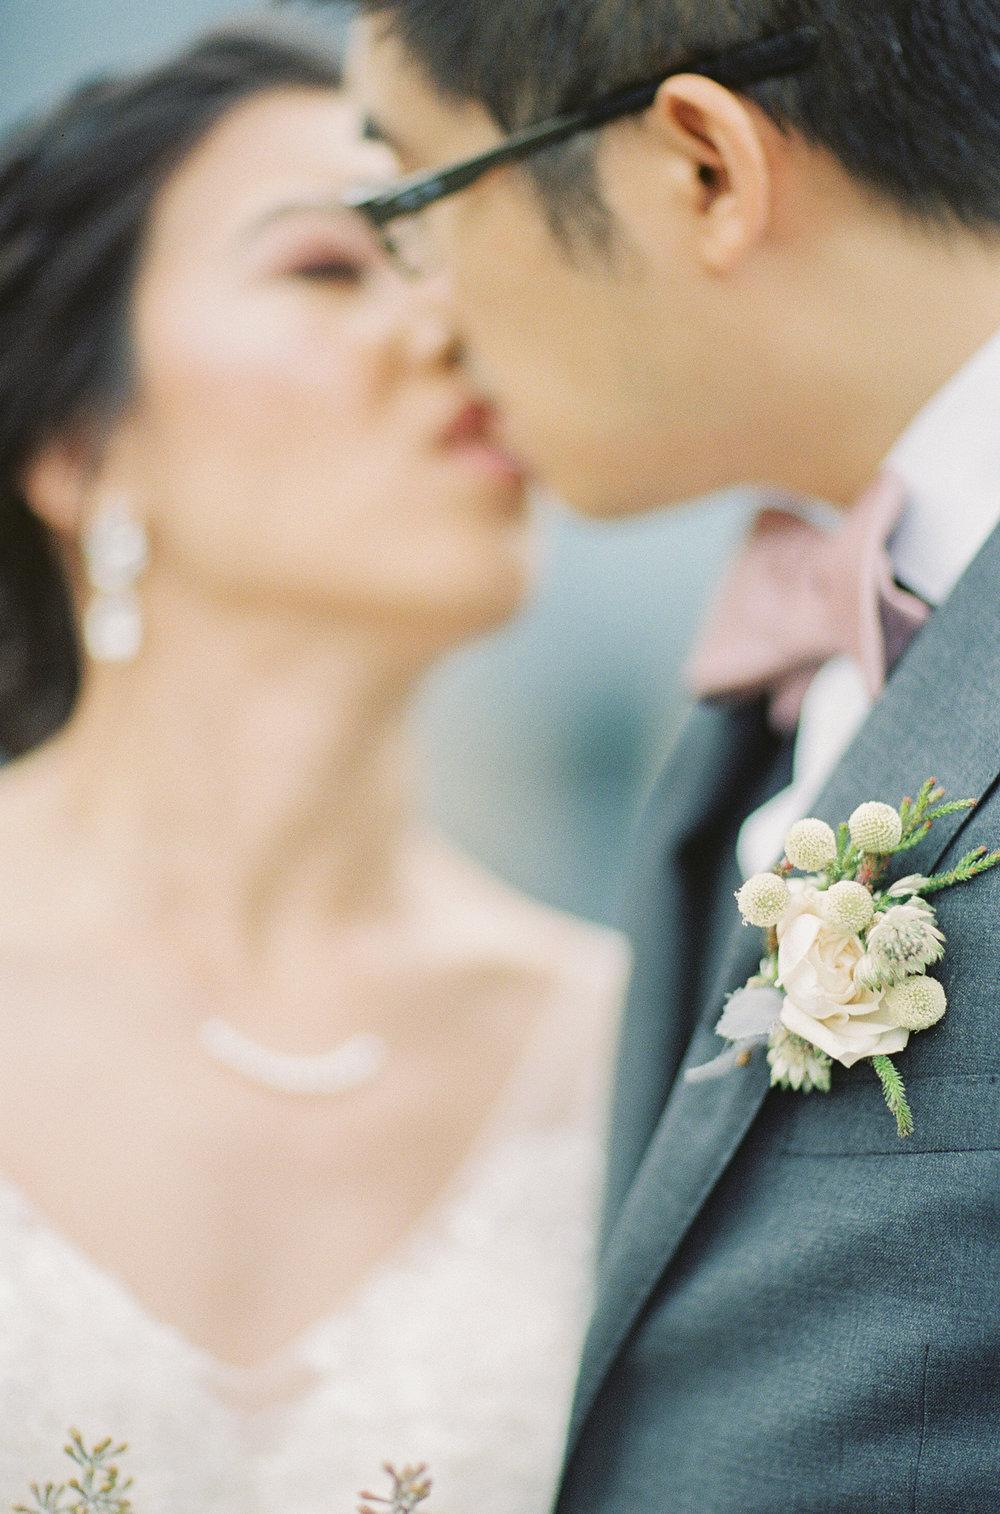 Paradise Banquet Hall Wedding - Bridal Portraits-43.jpg